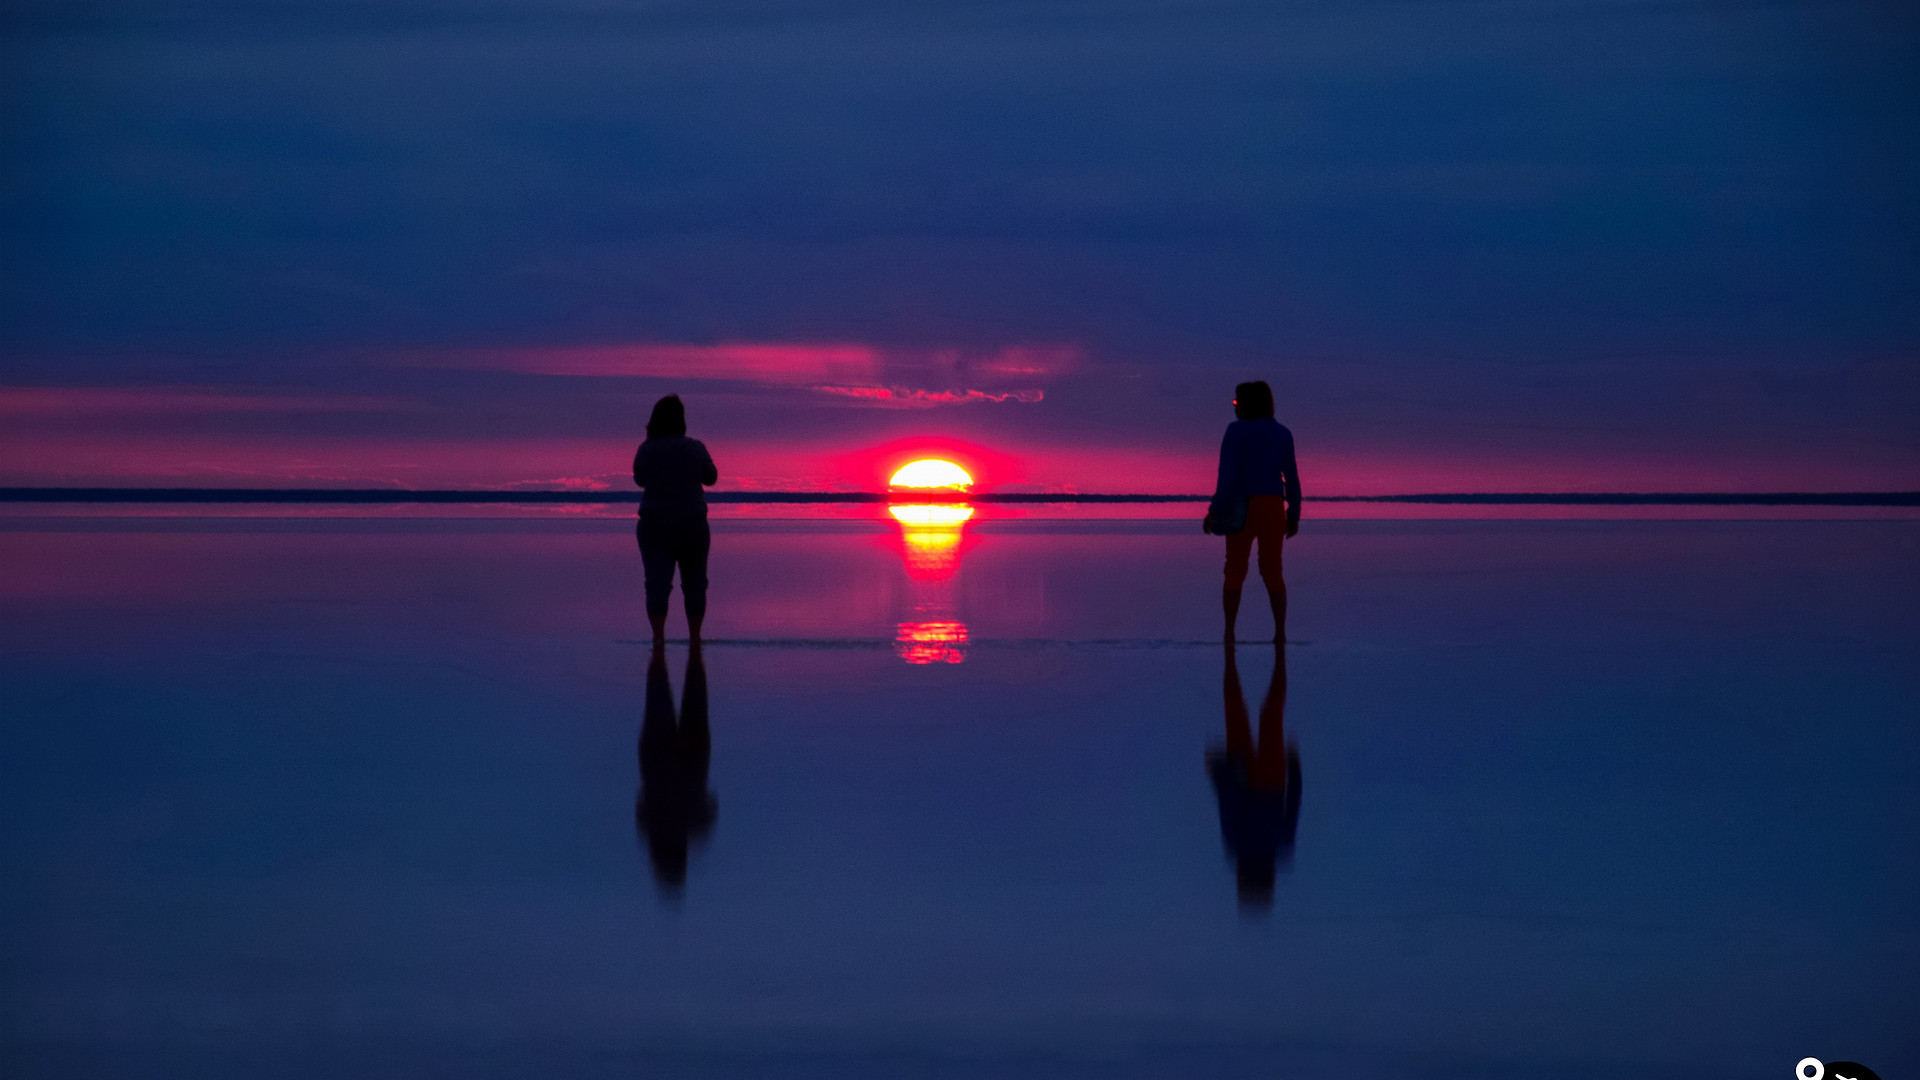 Солёное озеро-зеркало Эльтон (+1 день)